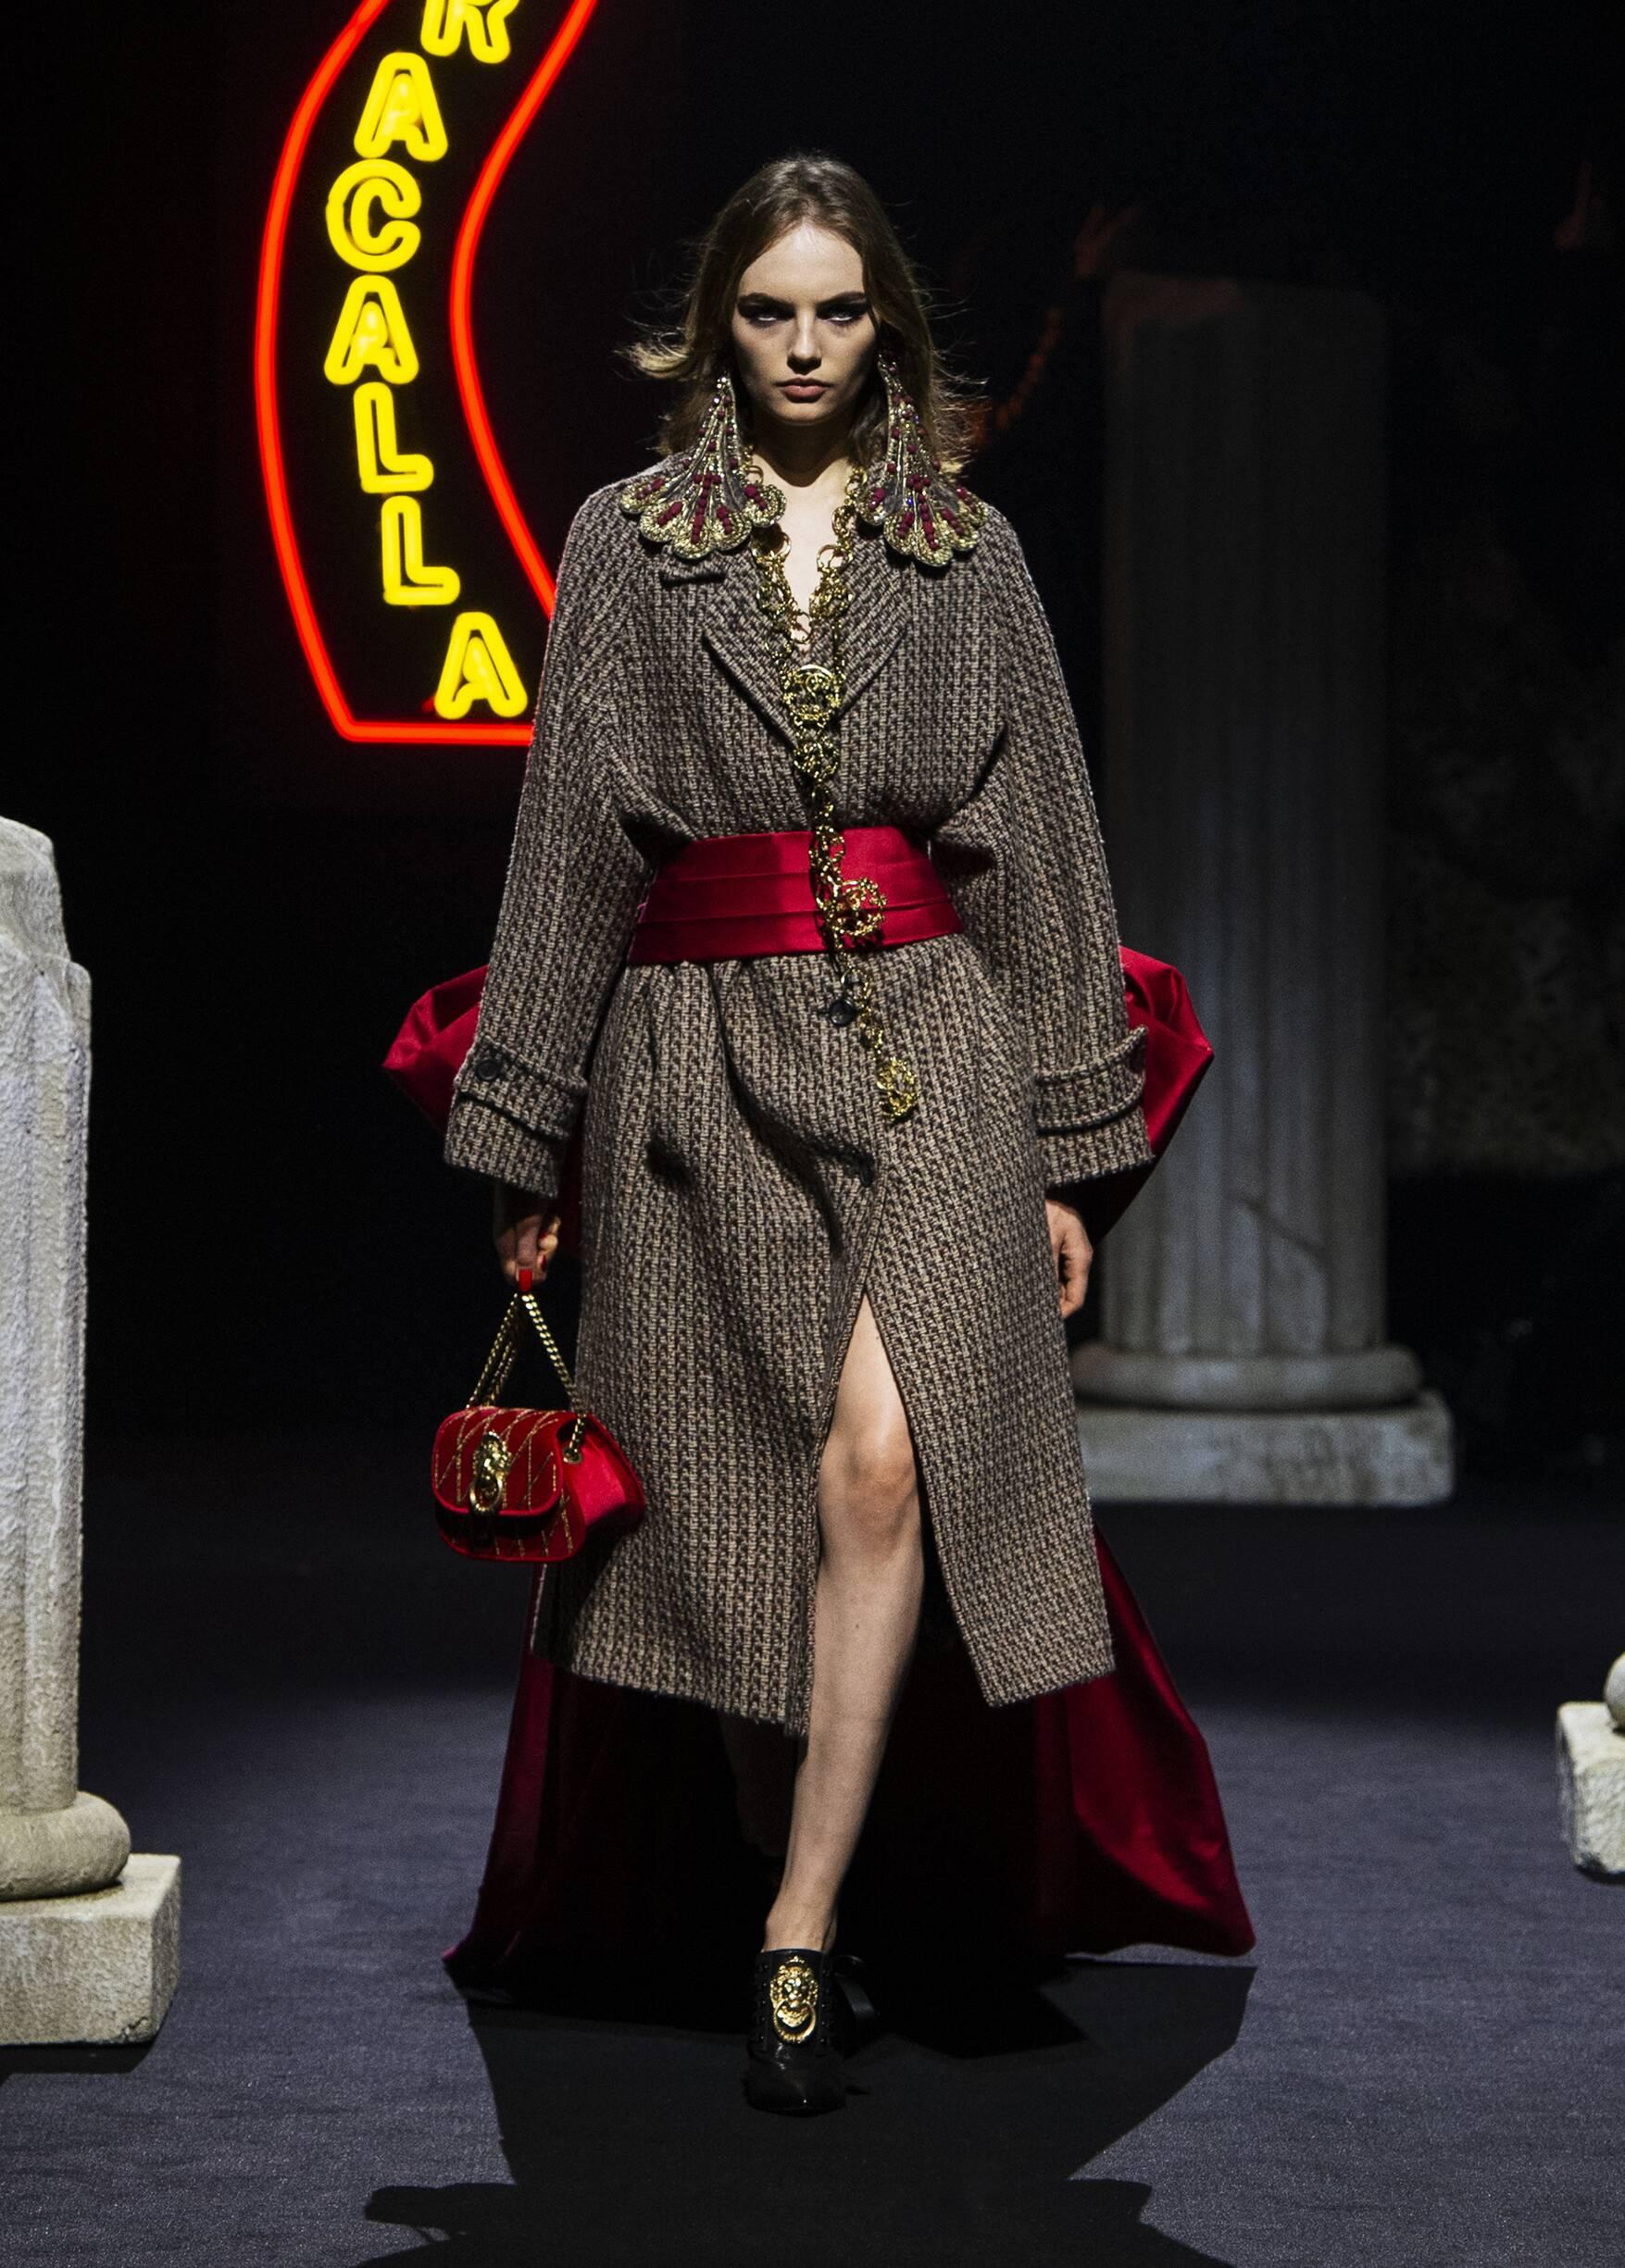 Moschino Fall Winter 2019 Menswear Women S Pre Collection The